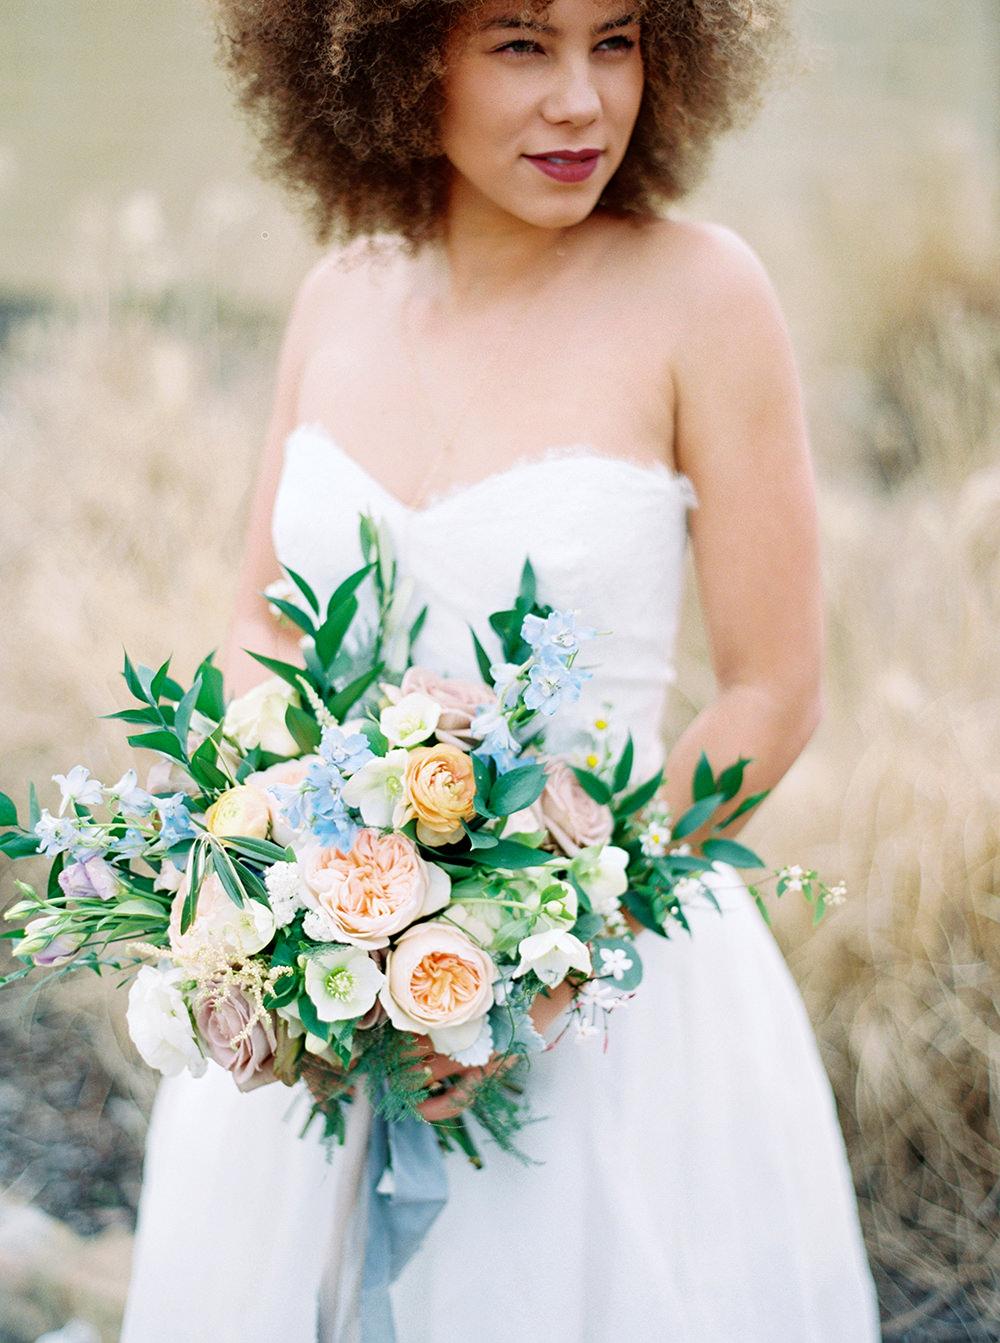 lush bridal bouquets - photo by Photos by Heart http://ruffledblog.com/downtown-birmingham-spring-wedding-inspiration